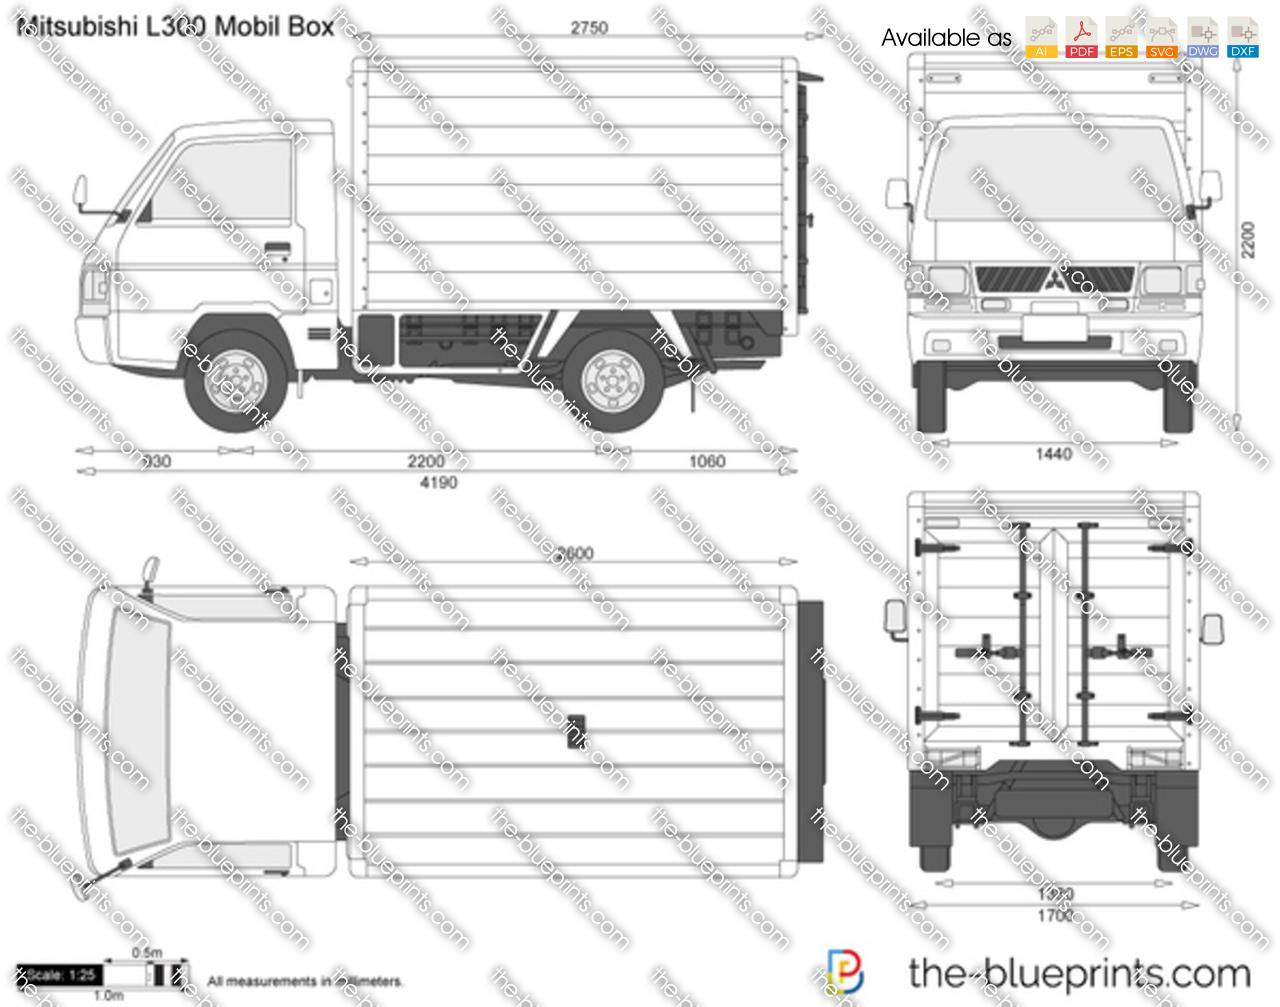 Mitsubishi L300 Mobil Box 1996